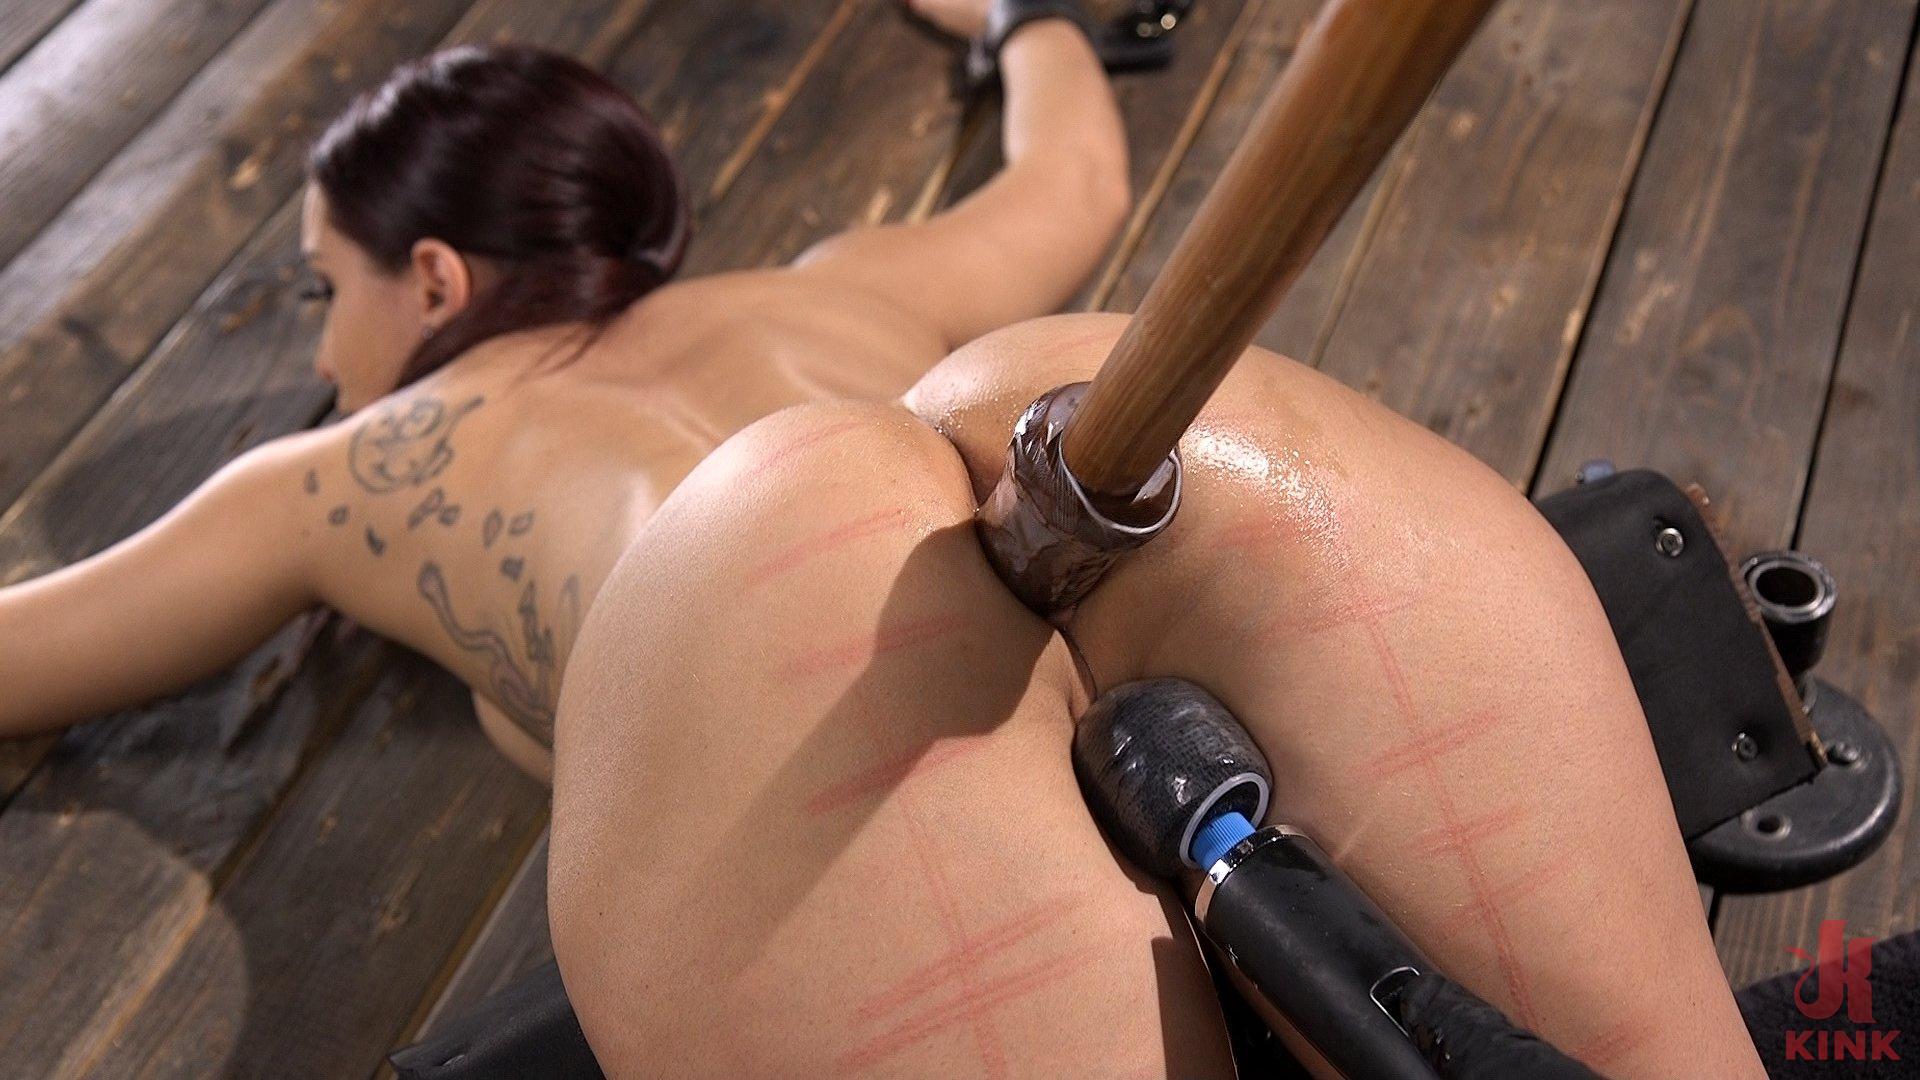 Photo number 13 from Gabriella Paltrova Anal Orgasm in Diabolical Predicament Bondage shot for Device Bondage on Kink.com. Featuring Gabriella Paltrova in hardcore BDSM & Fetish porn.